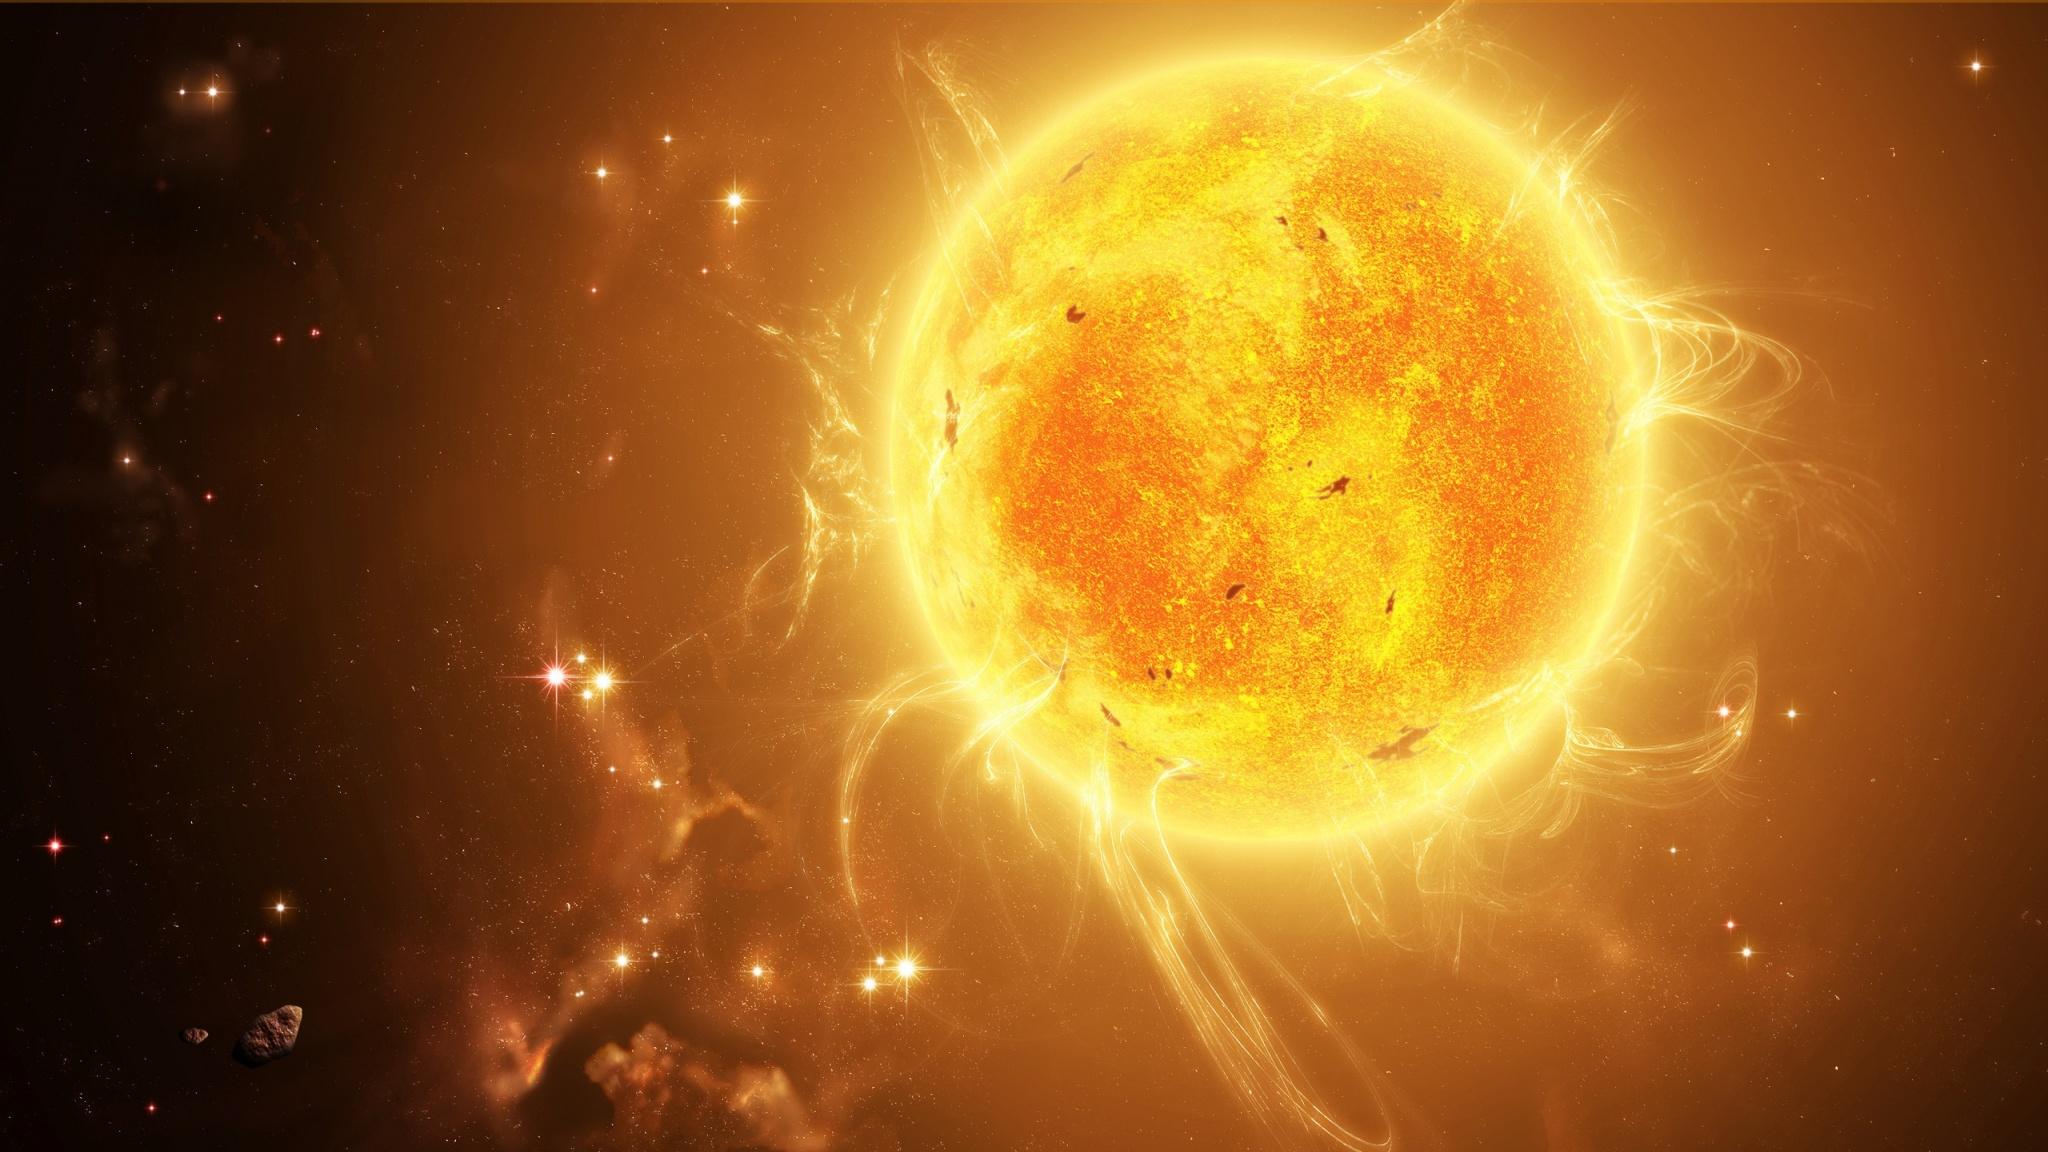 Space Sun 2048 x 1152 Download Close 2048x1152